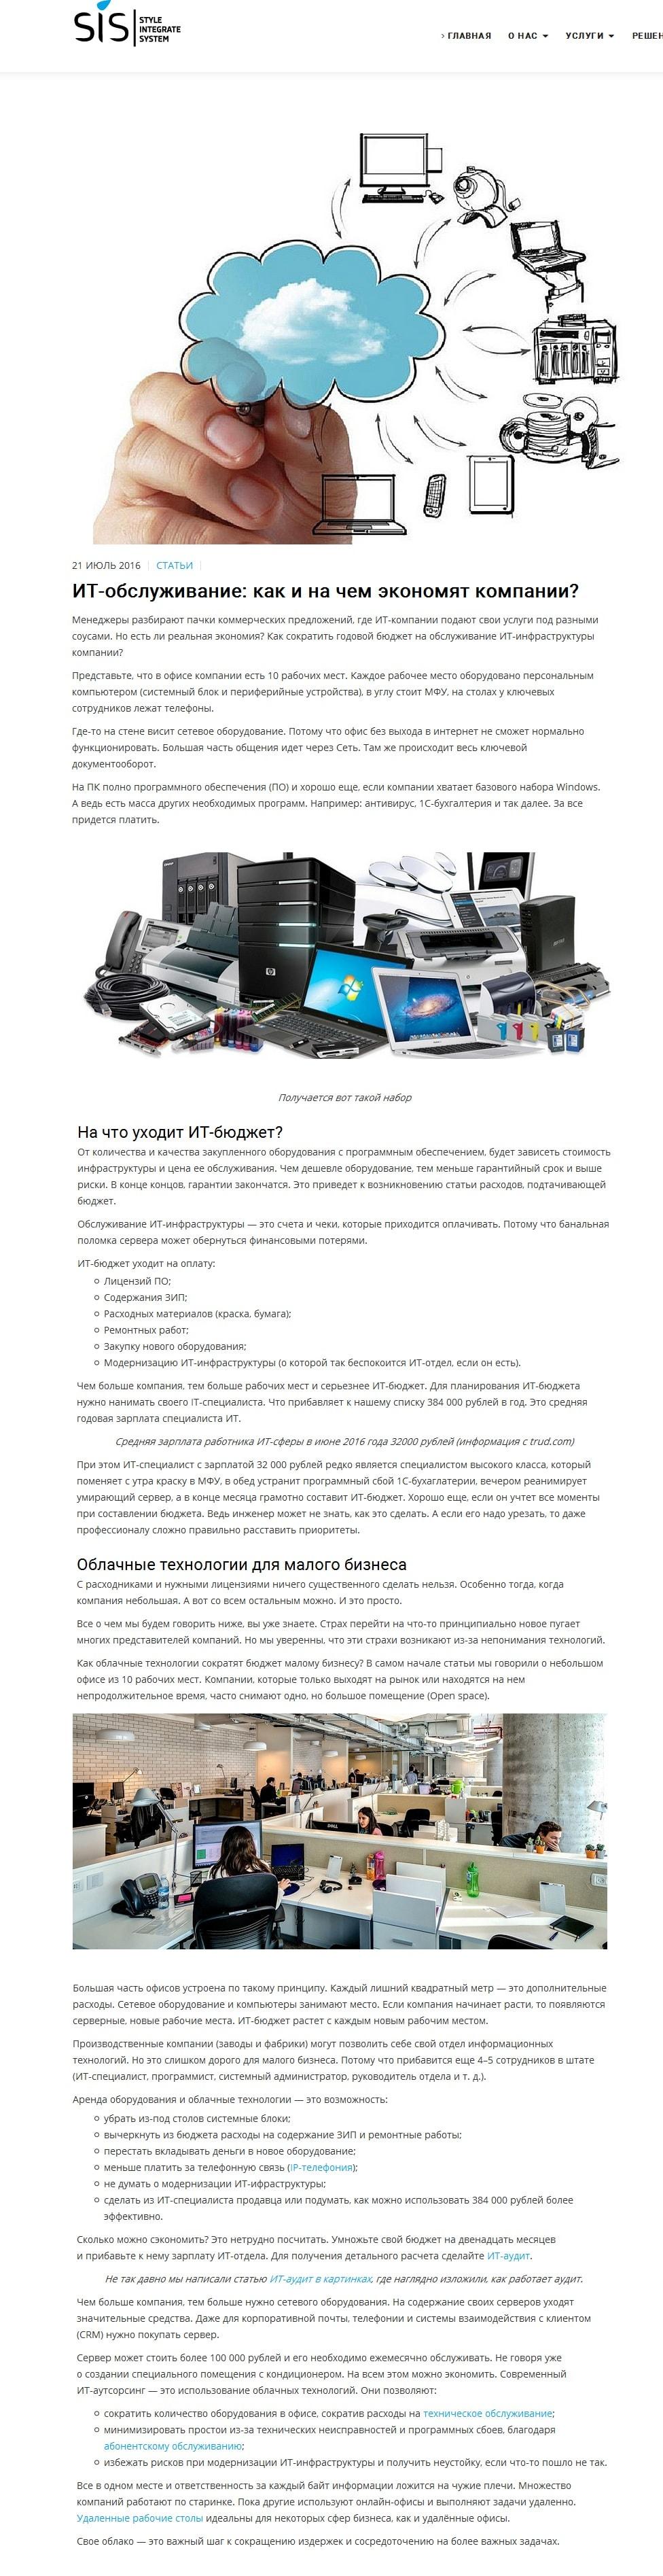 SEO текст для сайта ИТ-услуг